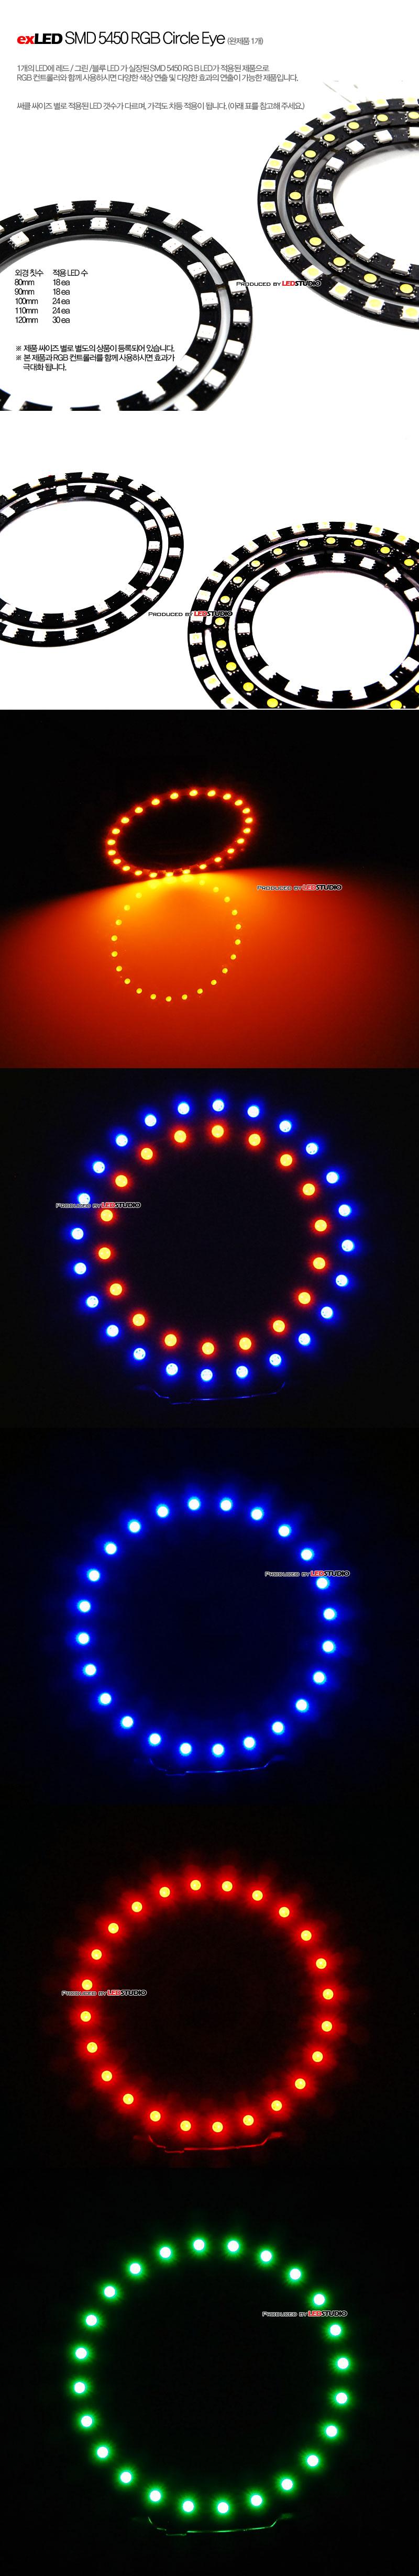 exLED SMD 5450 RGB 멀티컬러 Circle Eye 90mm 완제품 1EA